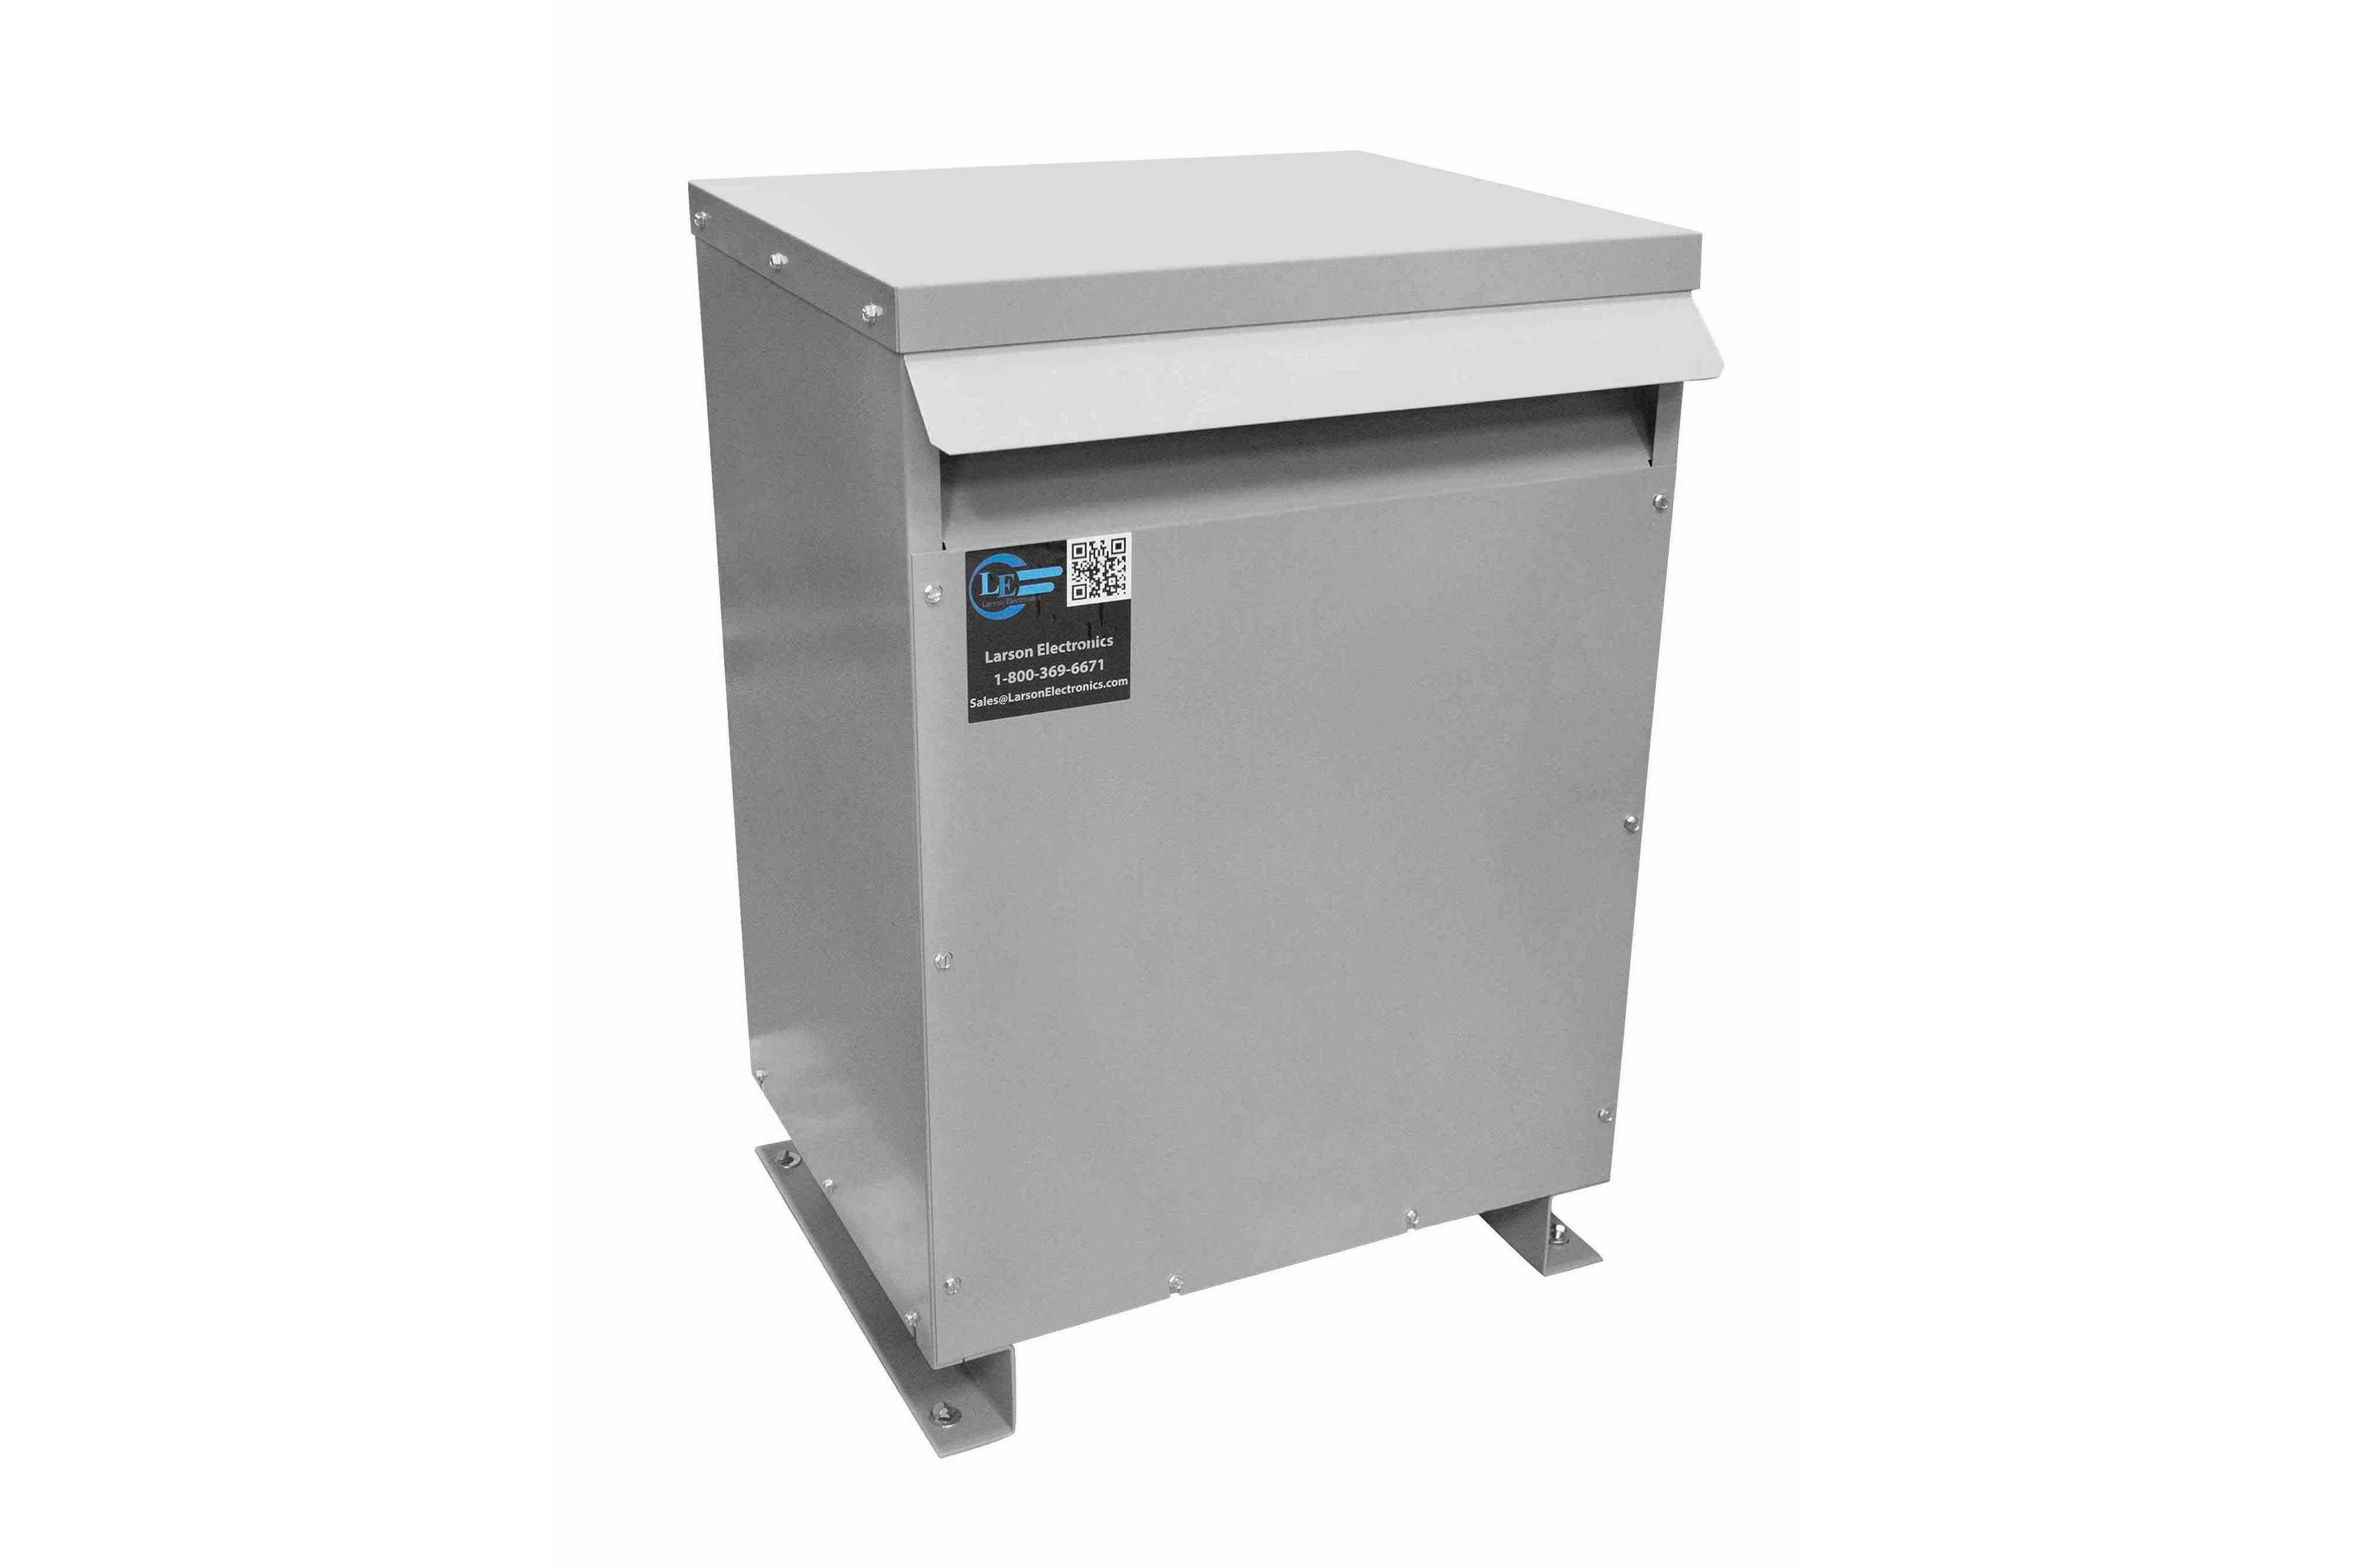 1000 kVA 3PH DOE Transformer, 575V Delta Primary, 208Y/120 Wye-N Secondary, N3R, Ventilated, 60 Hz